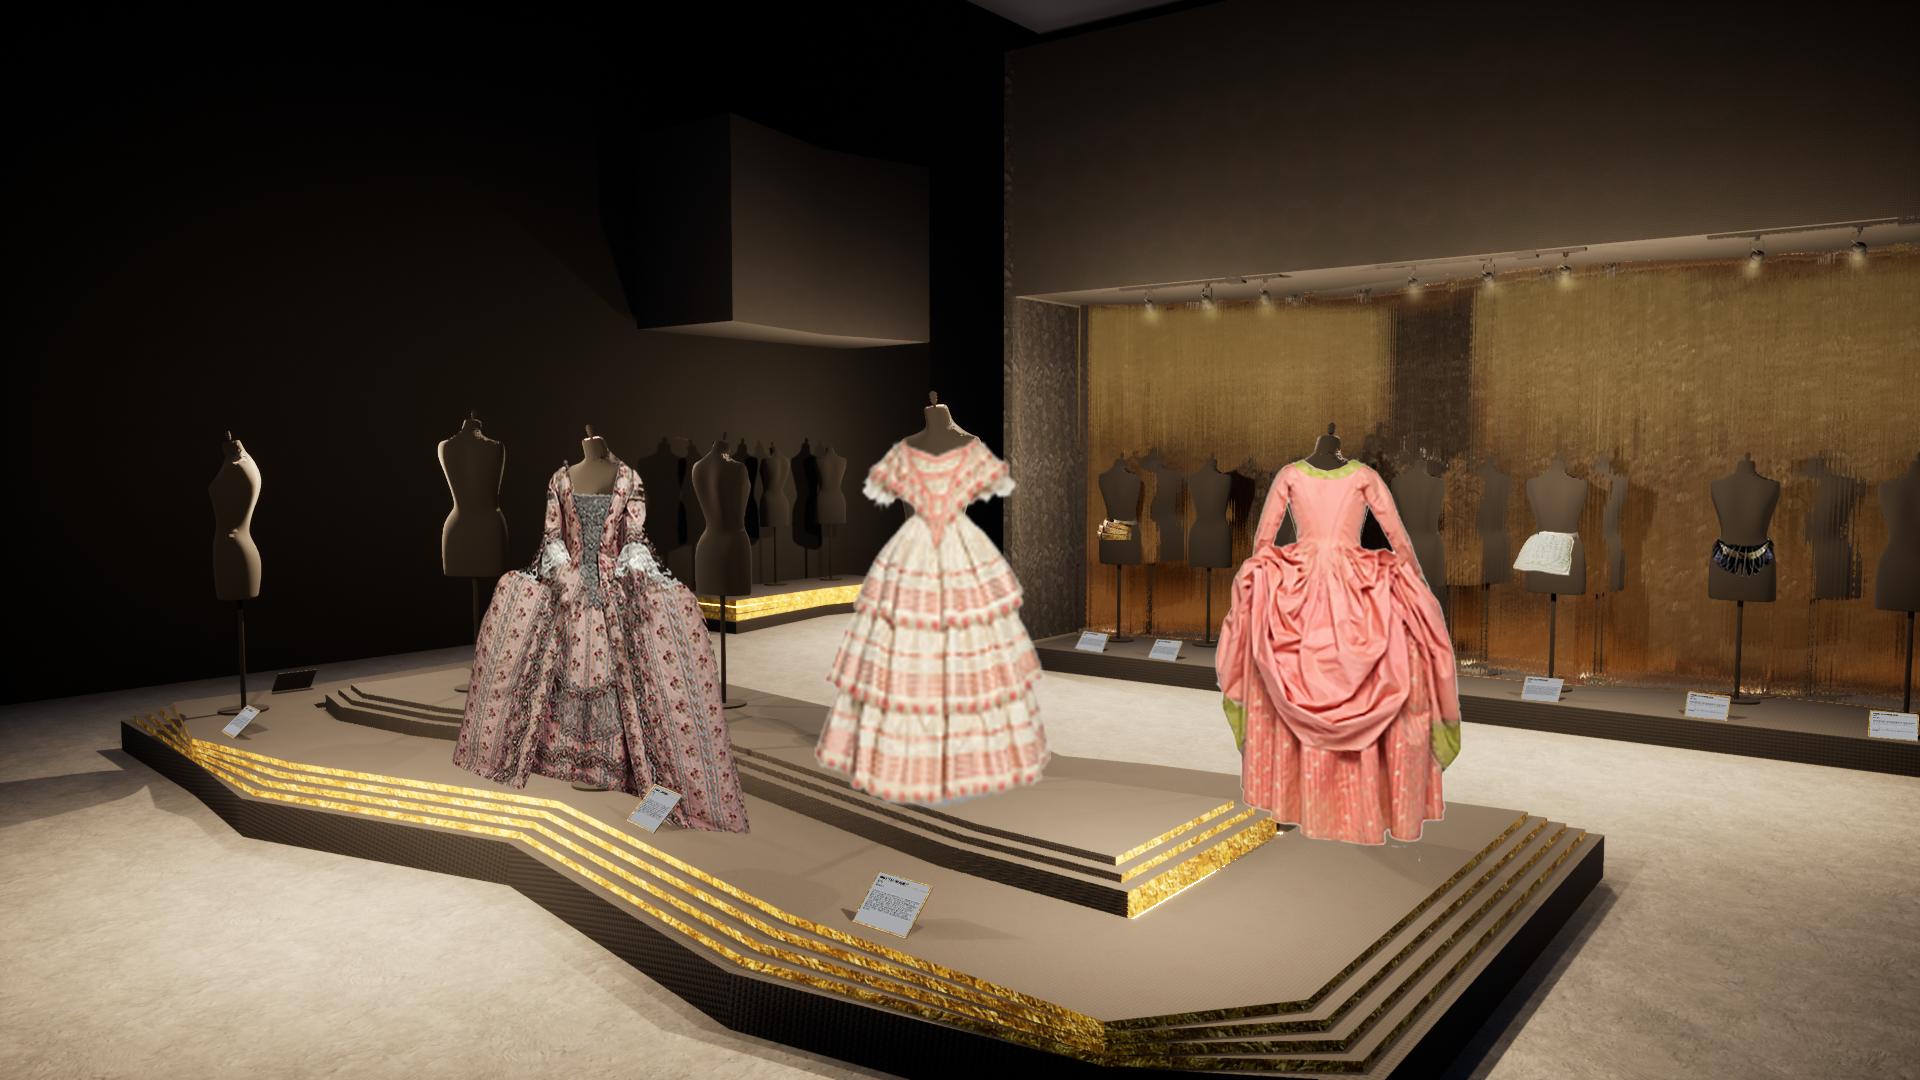 Fashioning the Body | Fashion Institute of Technology<br/><i>Ediley Collante</i>